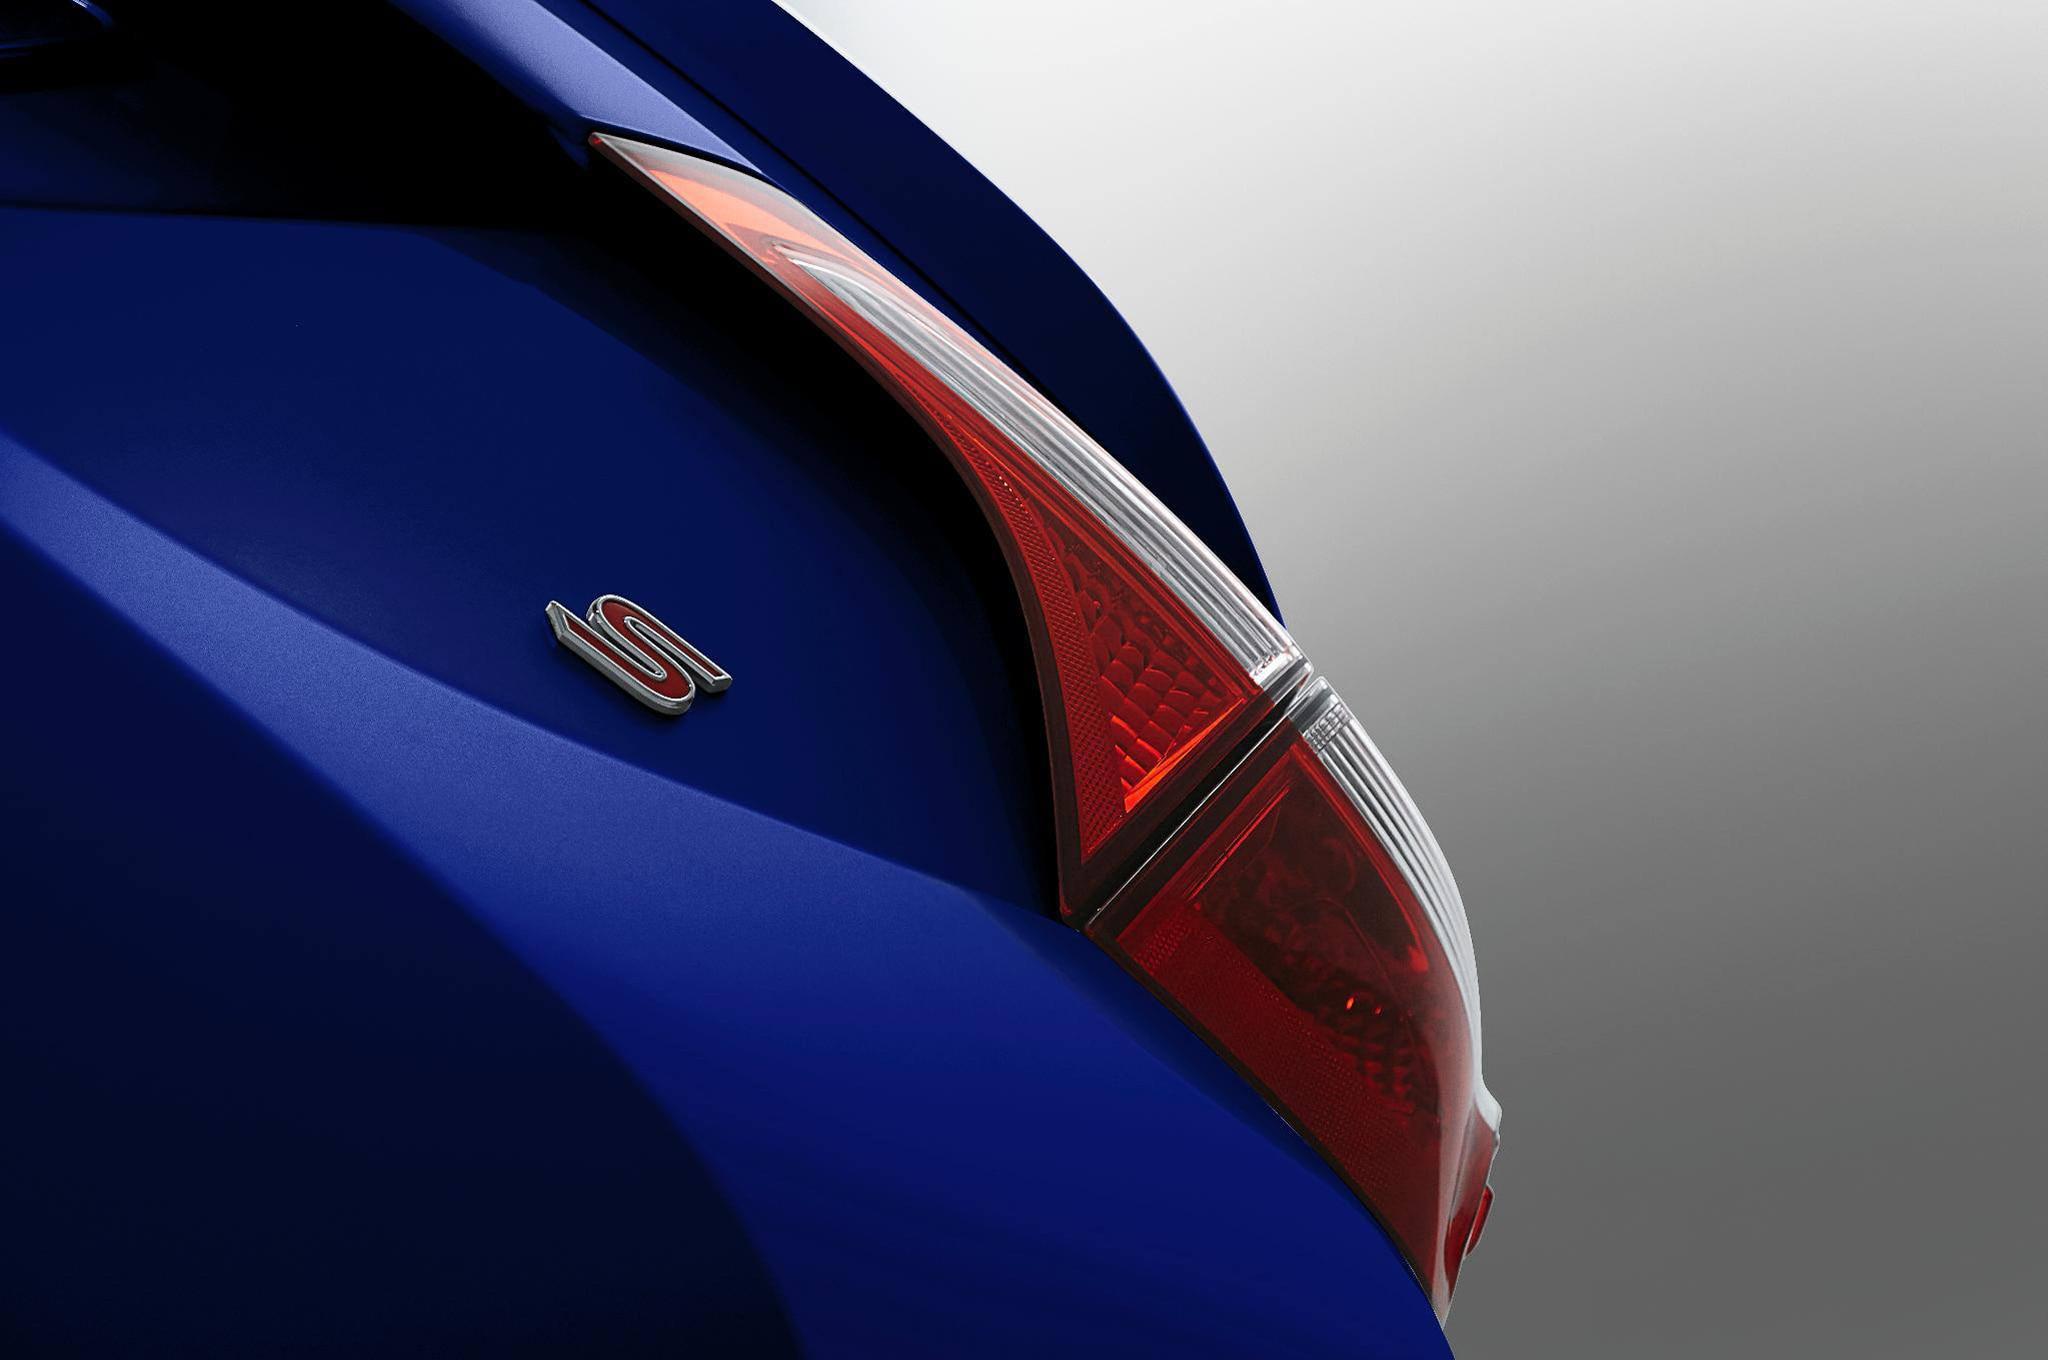 2014 Toyota Corolla Teaser Image 11